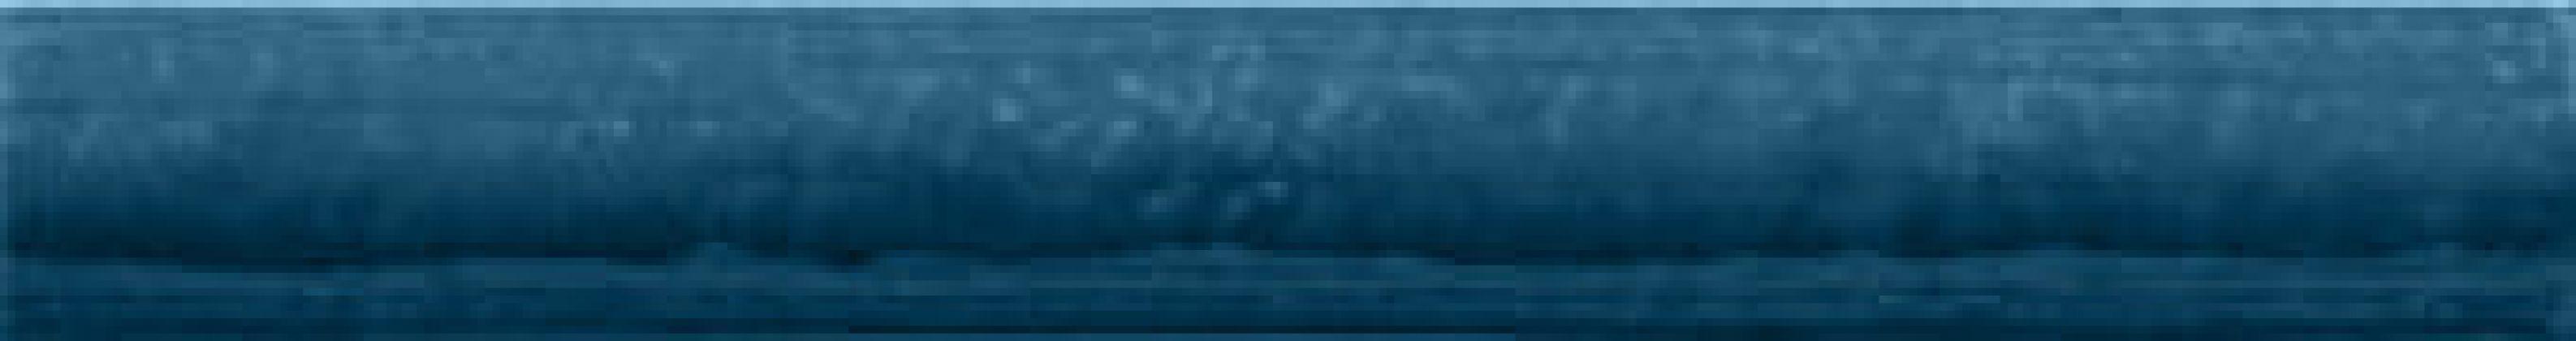 TORELO CHIC BONDI 2x15